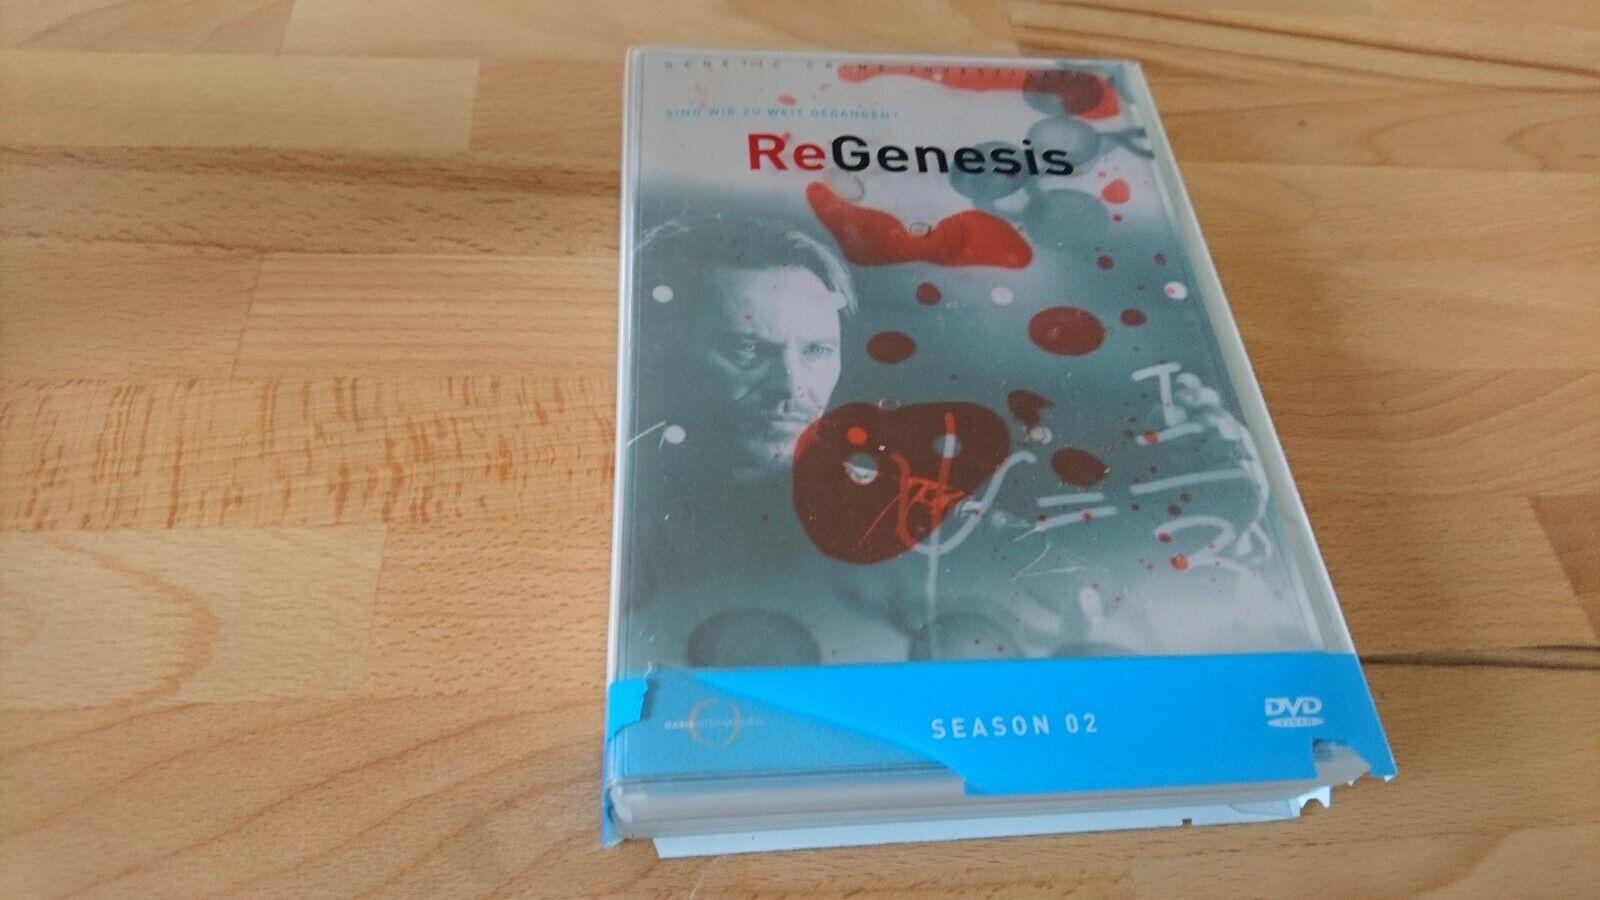 ReGenesis - Season 02 - 2er DVD Film